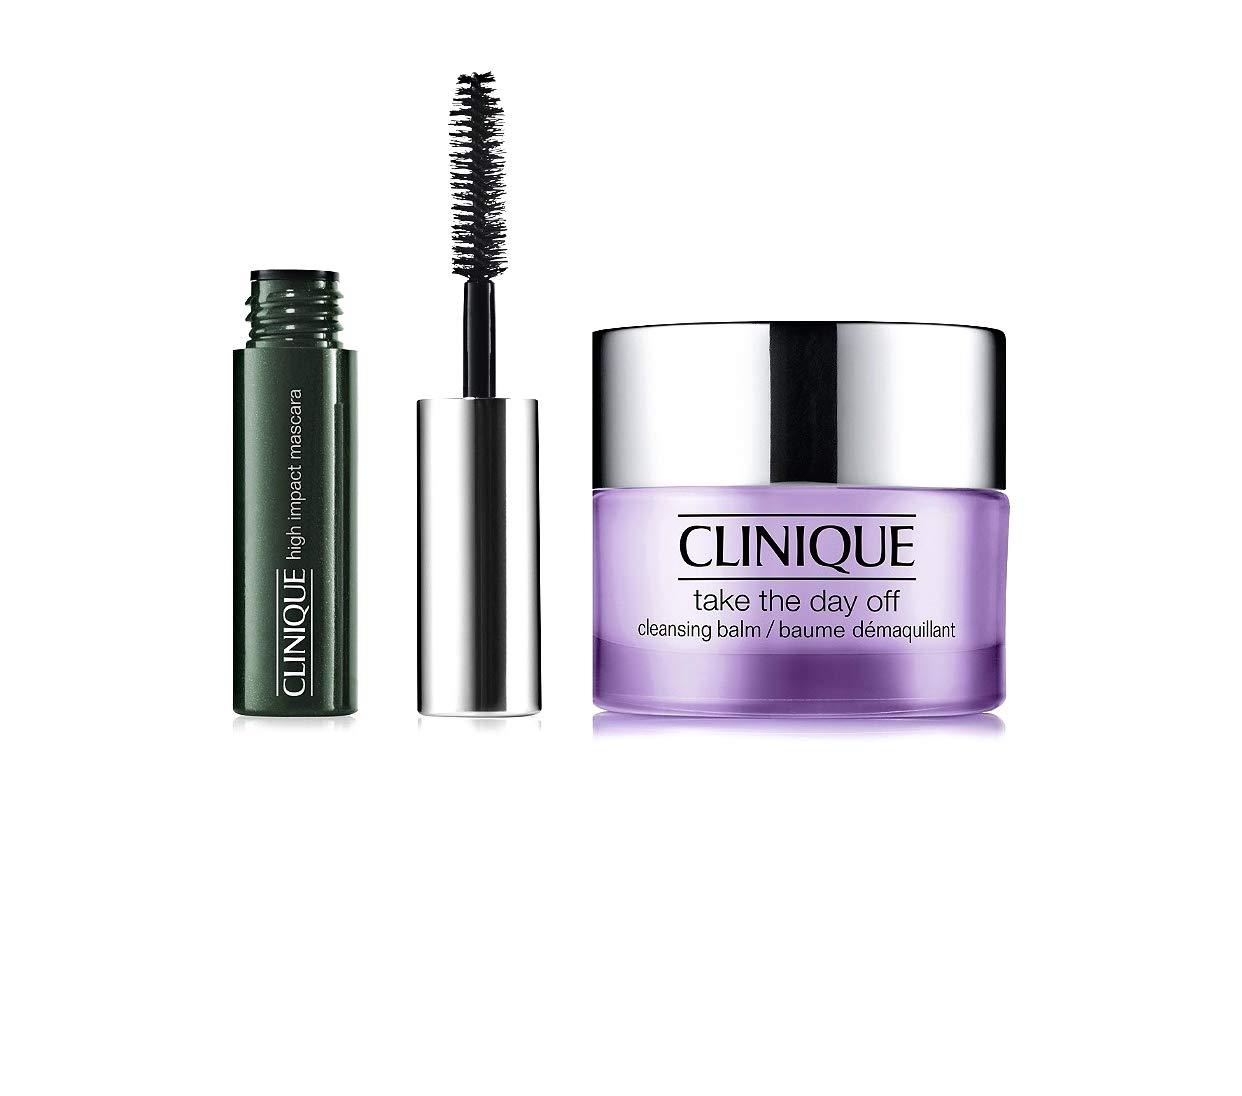 2fa0e04bd3a Amazon.com : Clinìque Take The Day Off Cleansing Balm 0.5 fl oz & Travel  Size High Impact Mascara 01 Black ~ Trial Size Duo : Beauty